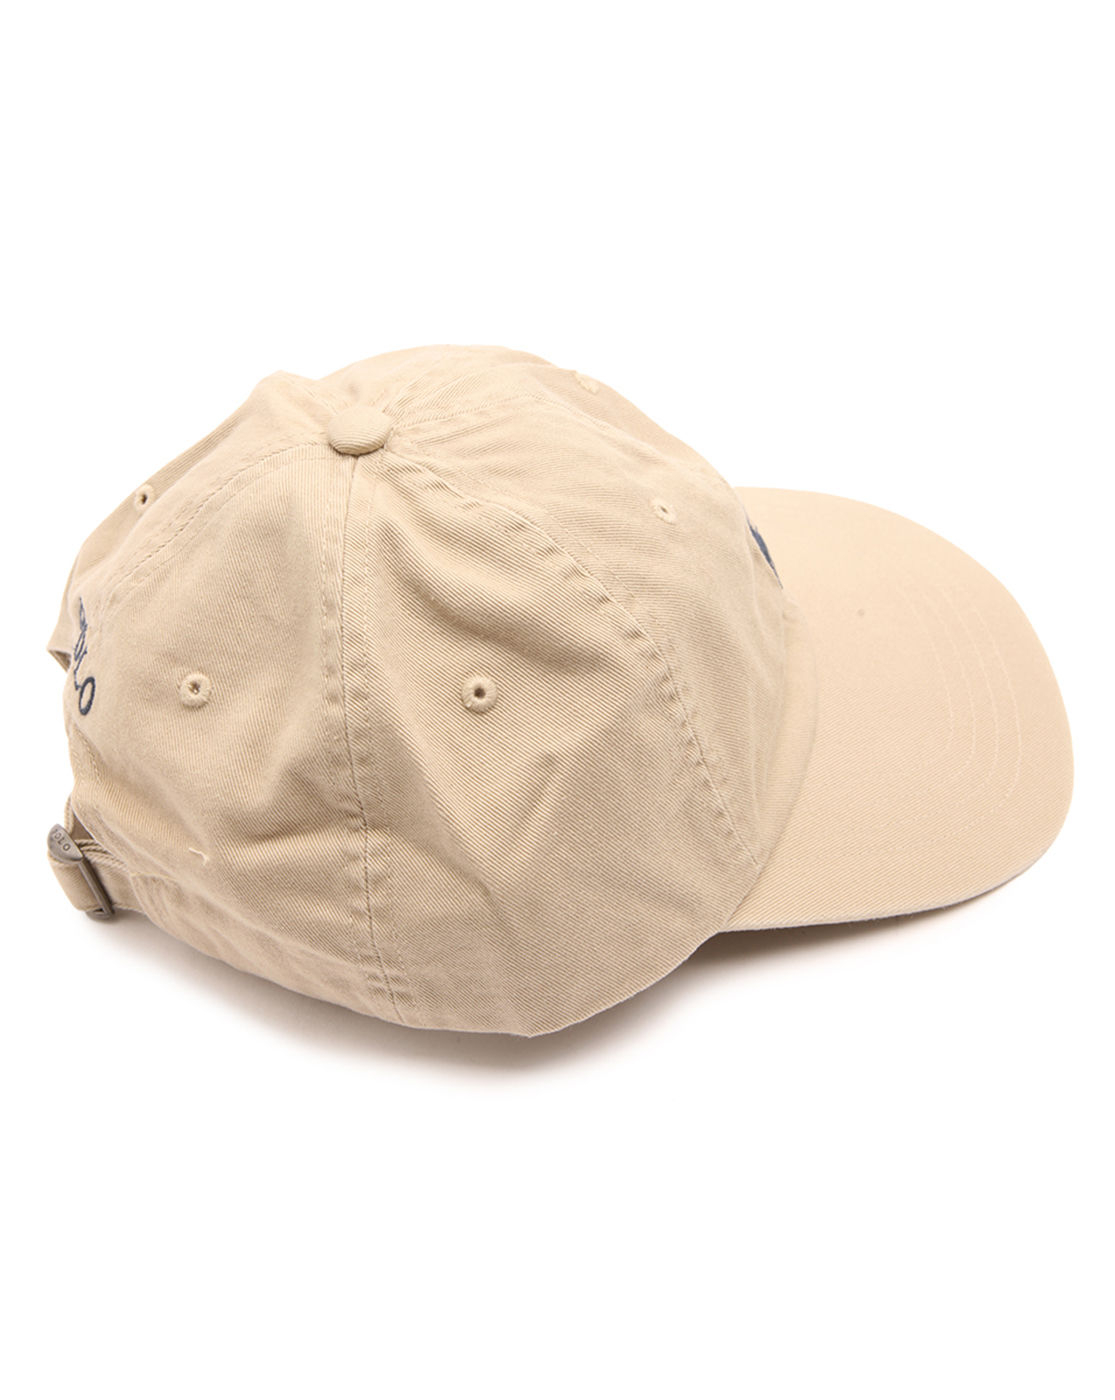 polo ralph lauren classic sport beige cap in beige for men lyst. Black Bedroom Furniture Sets. Home Design Ideas